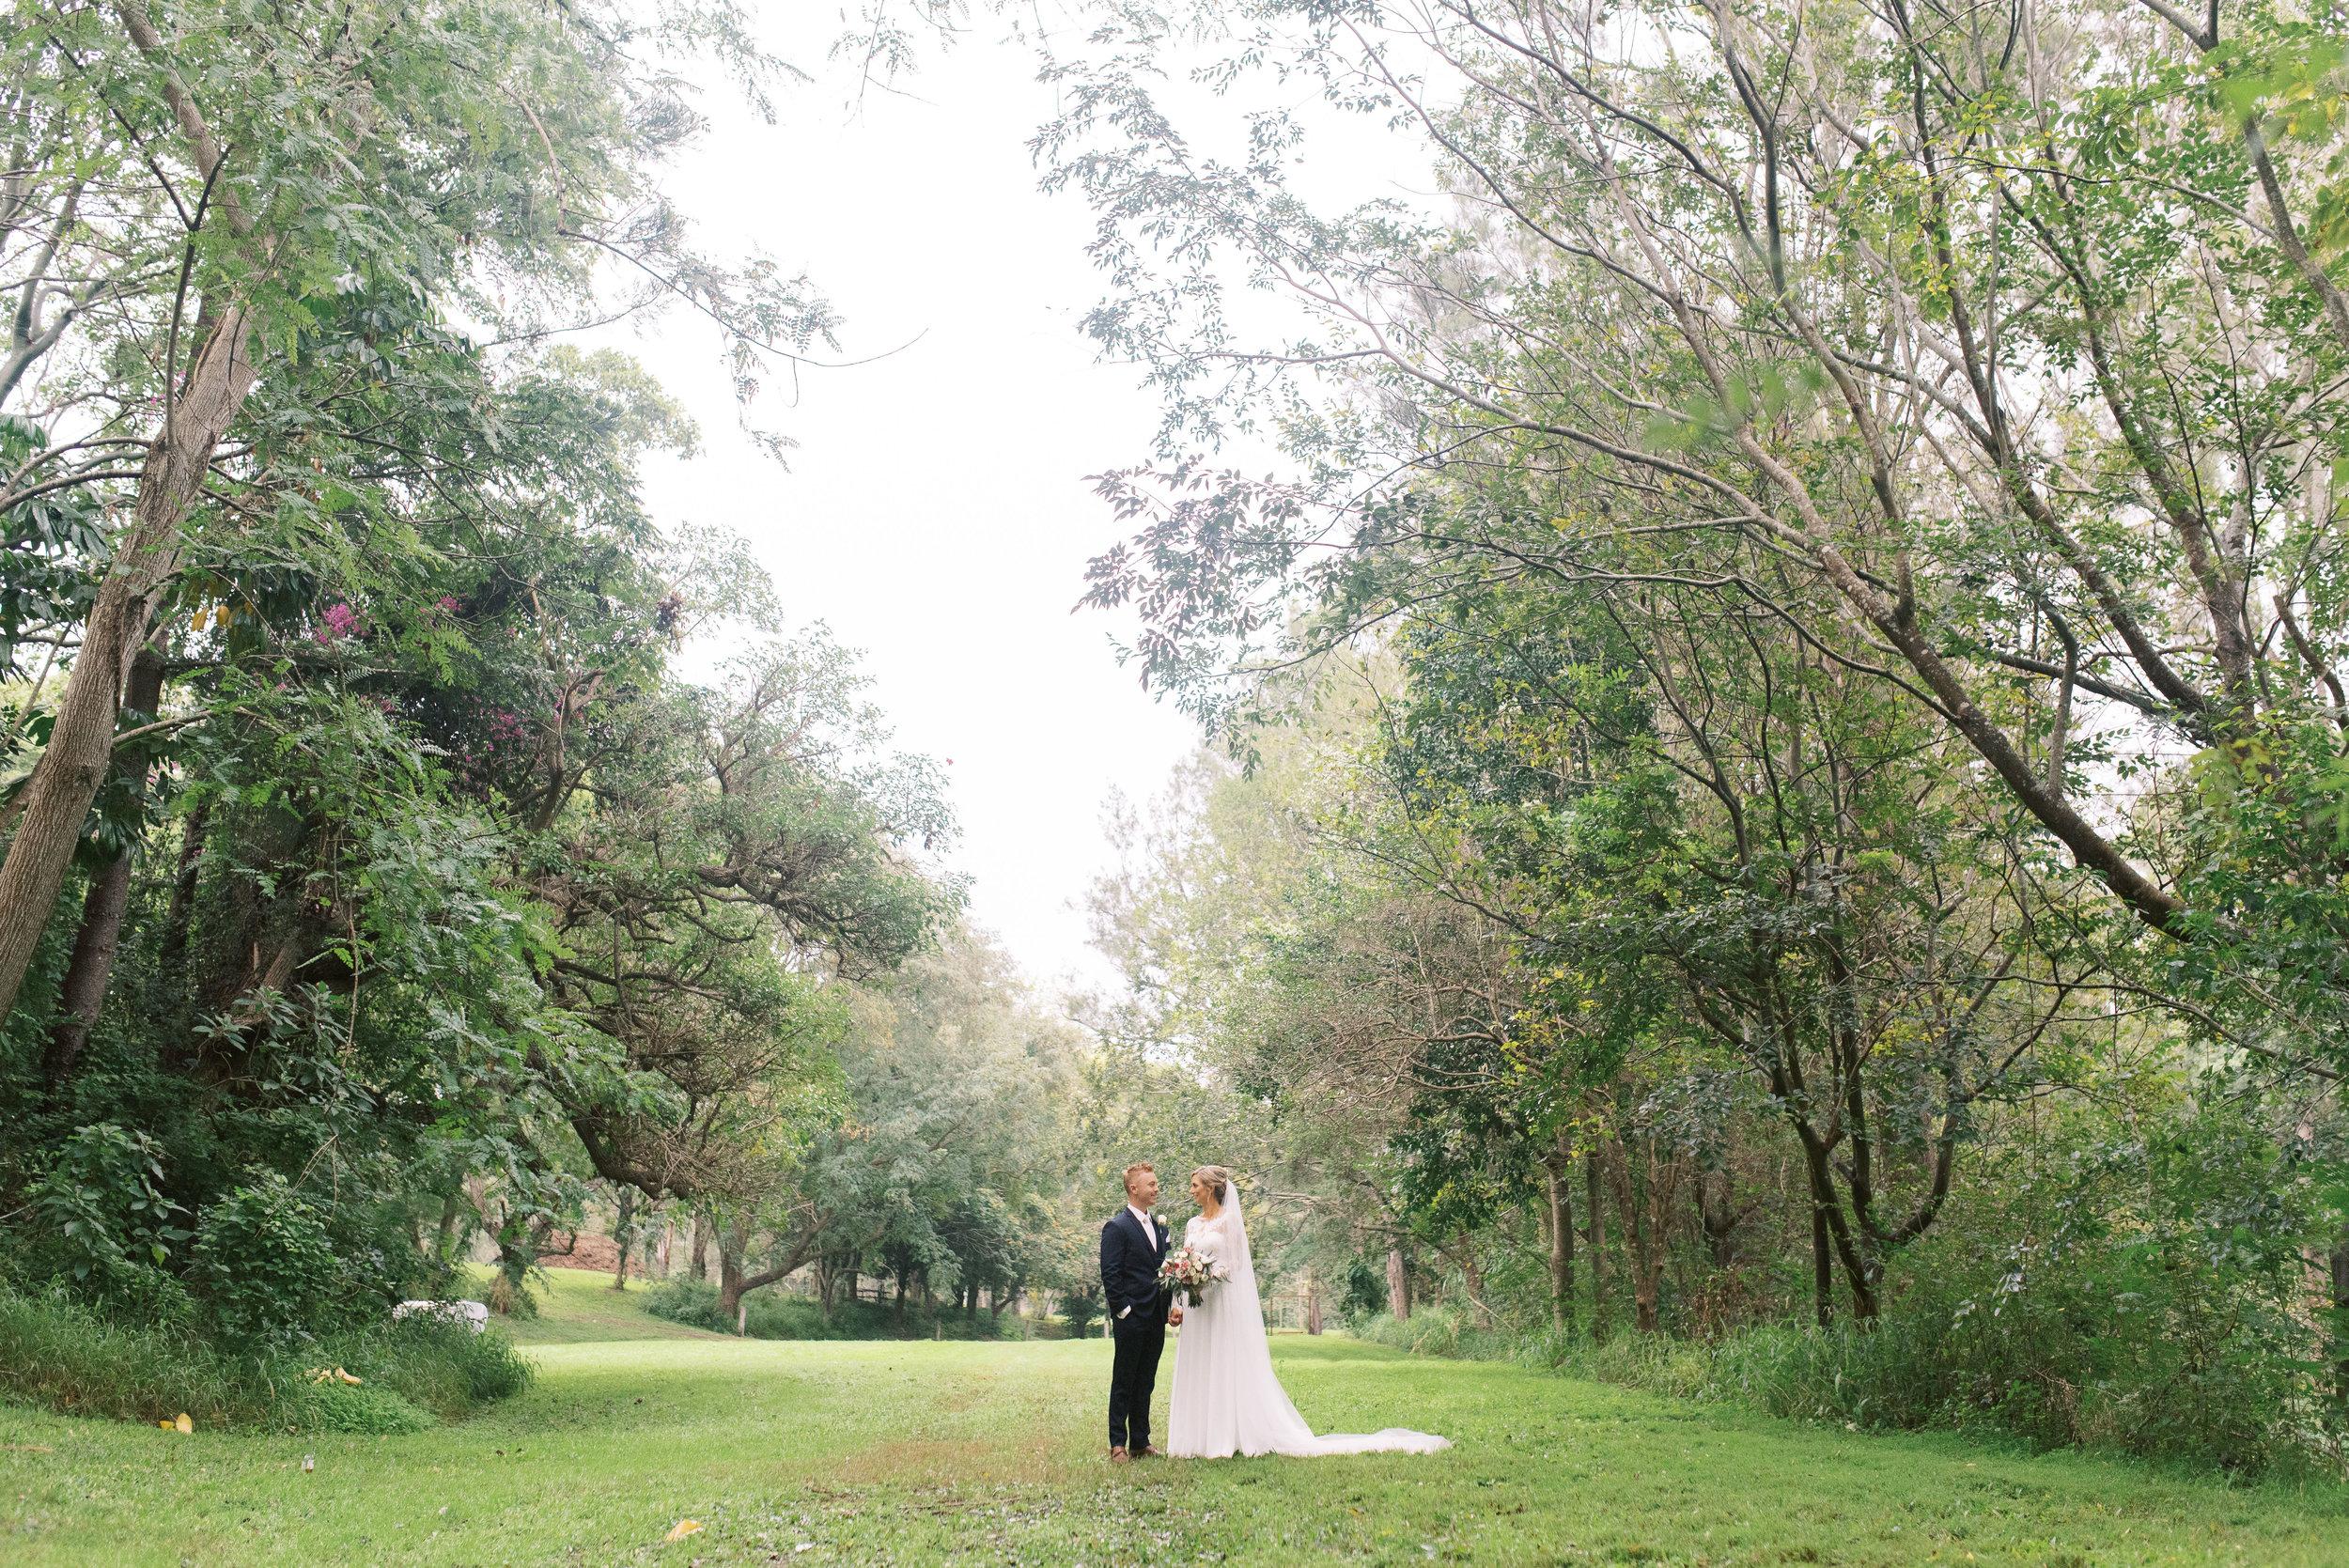 brisbane-gold-coast-sunshine-coast-romantic-wedding-photographer-62.jpg